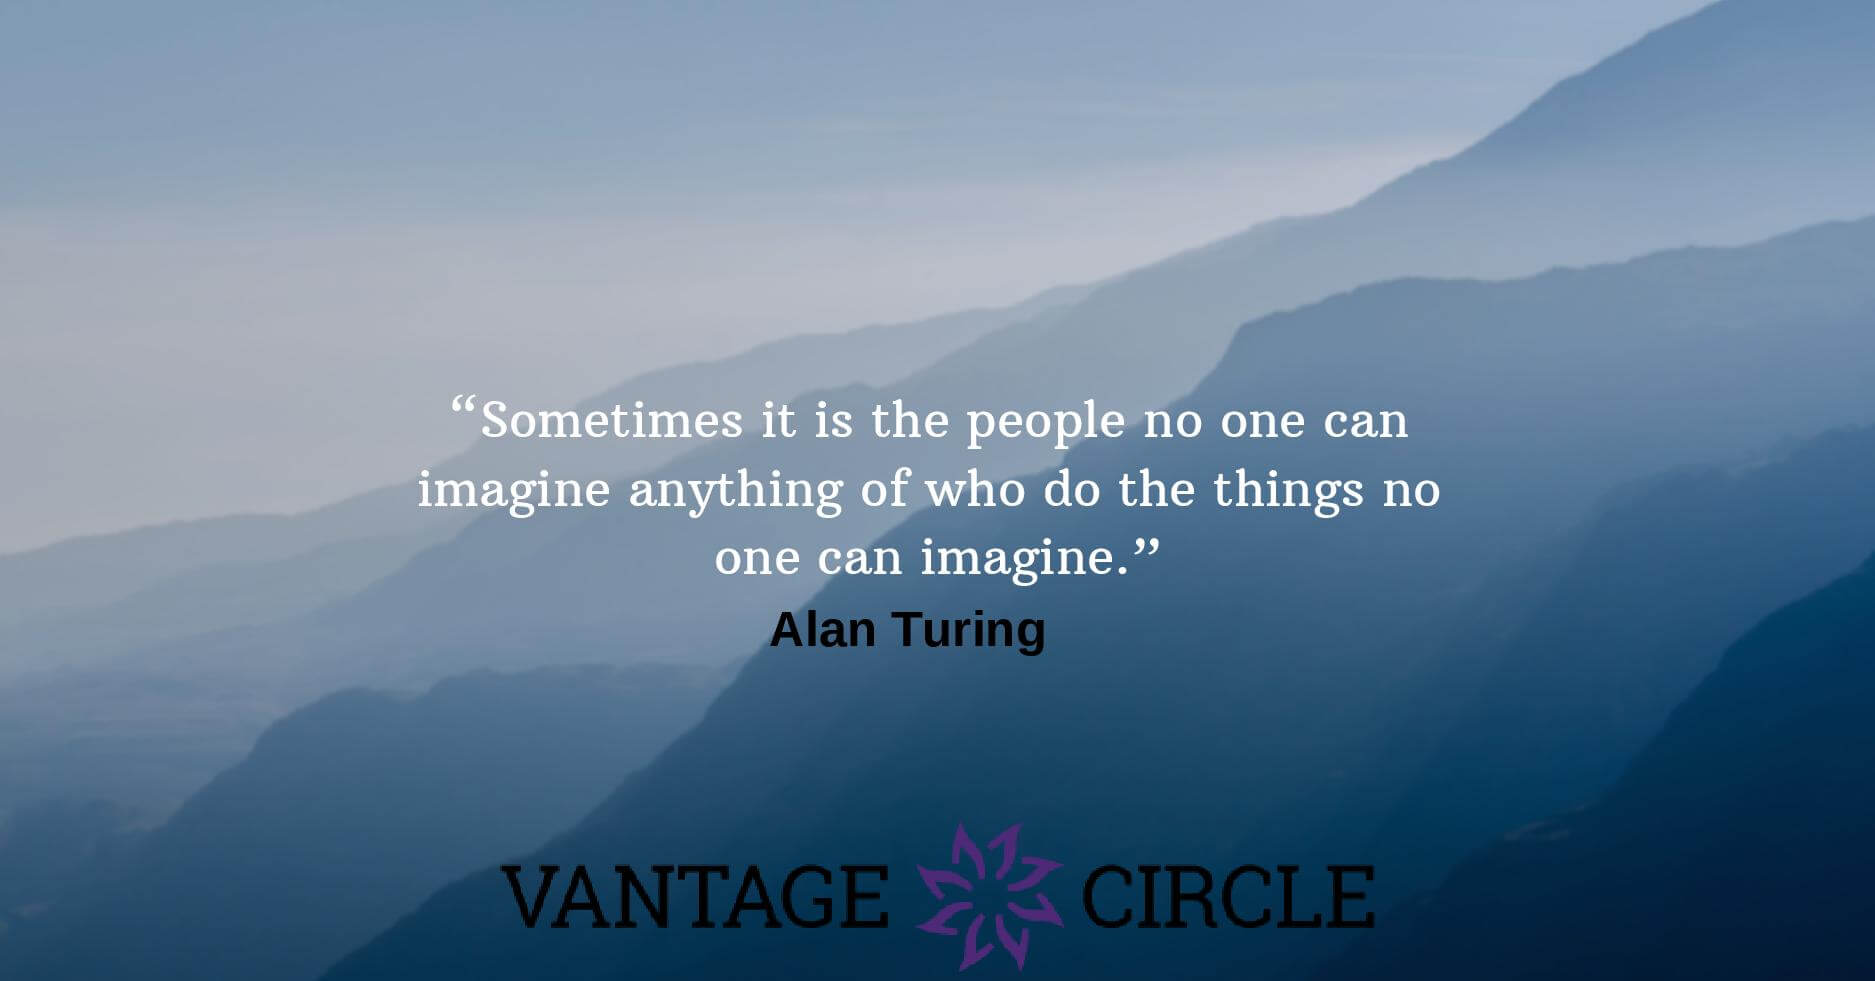 Employee-motivational-quotes-Alan-Turing